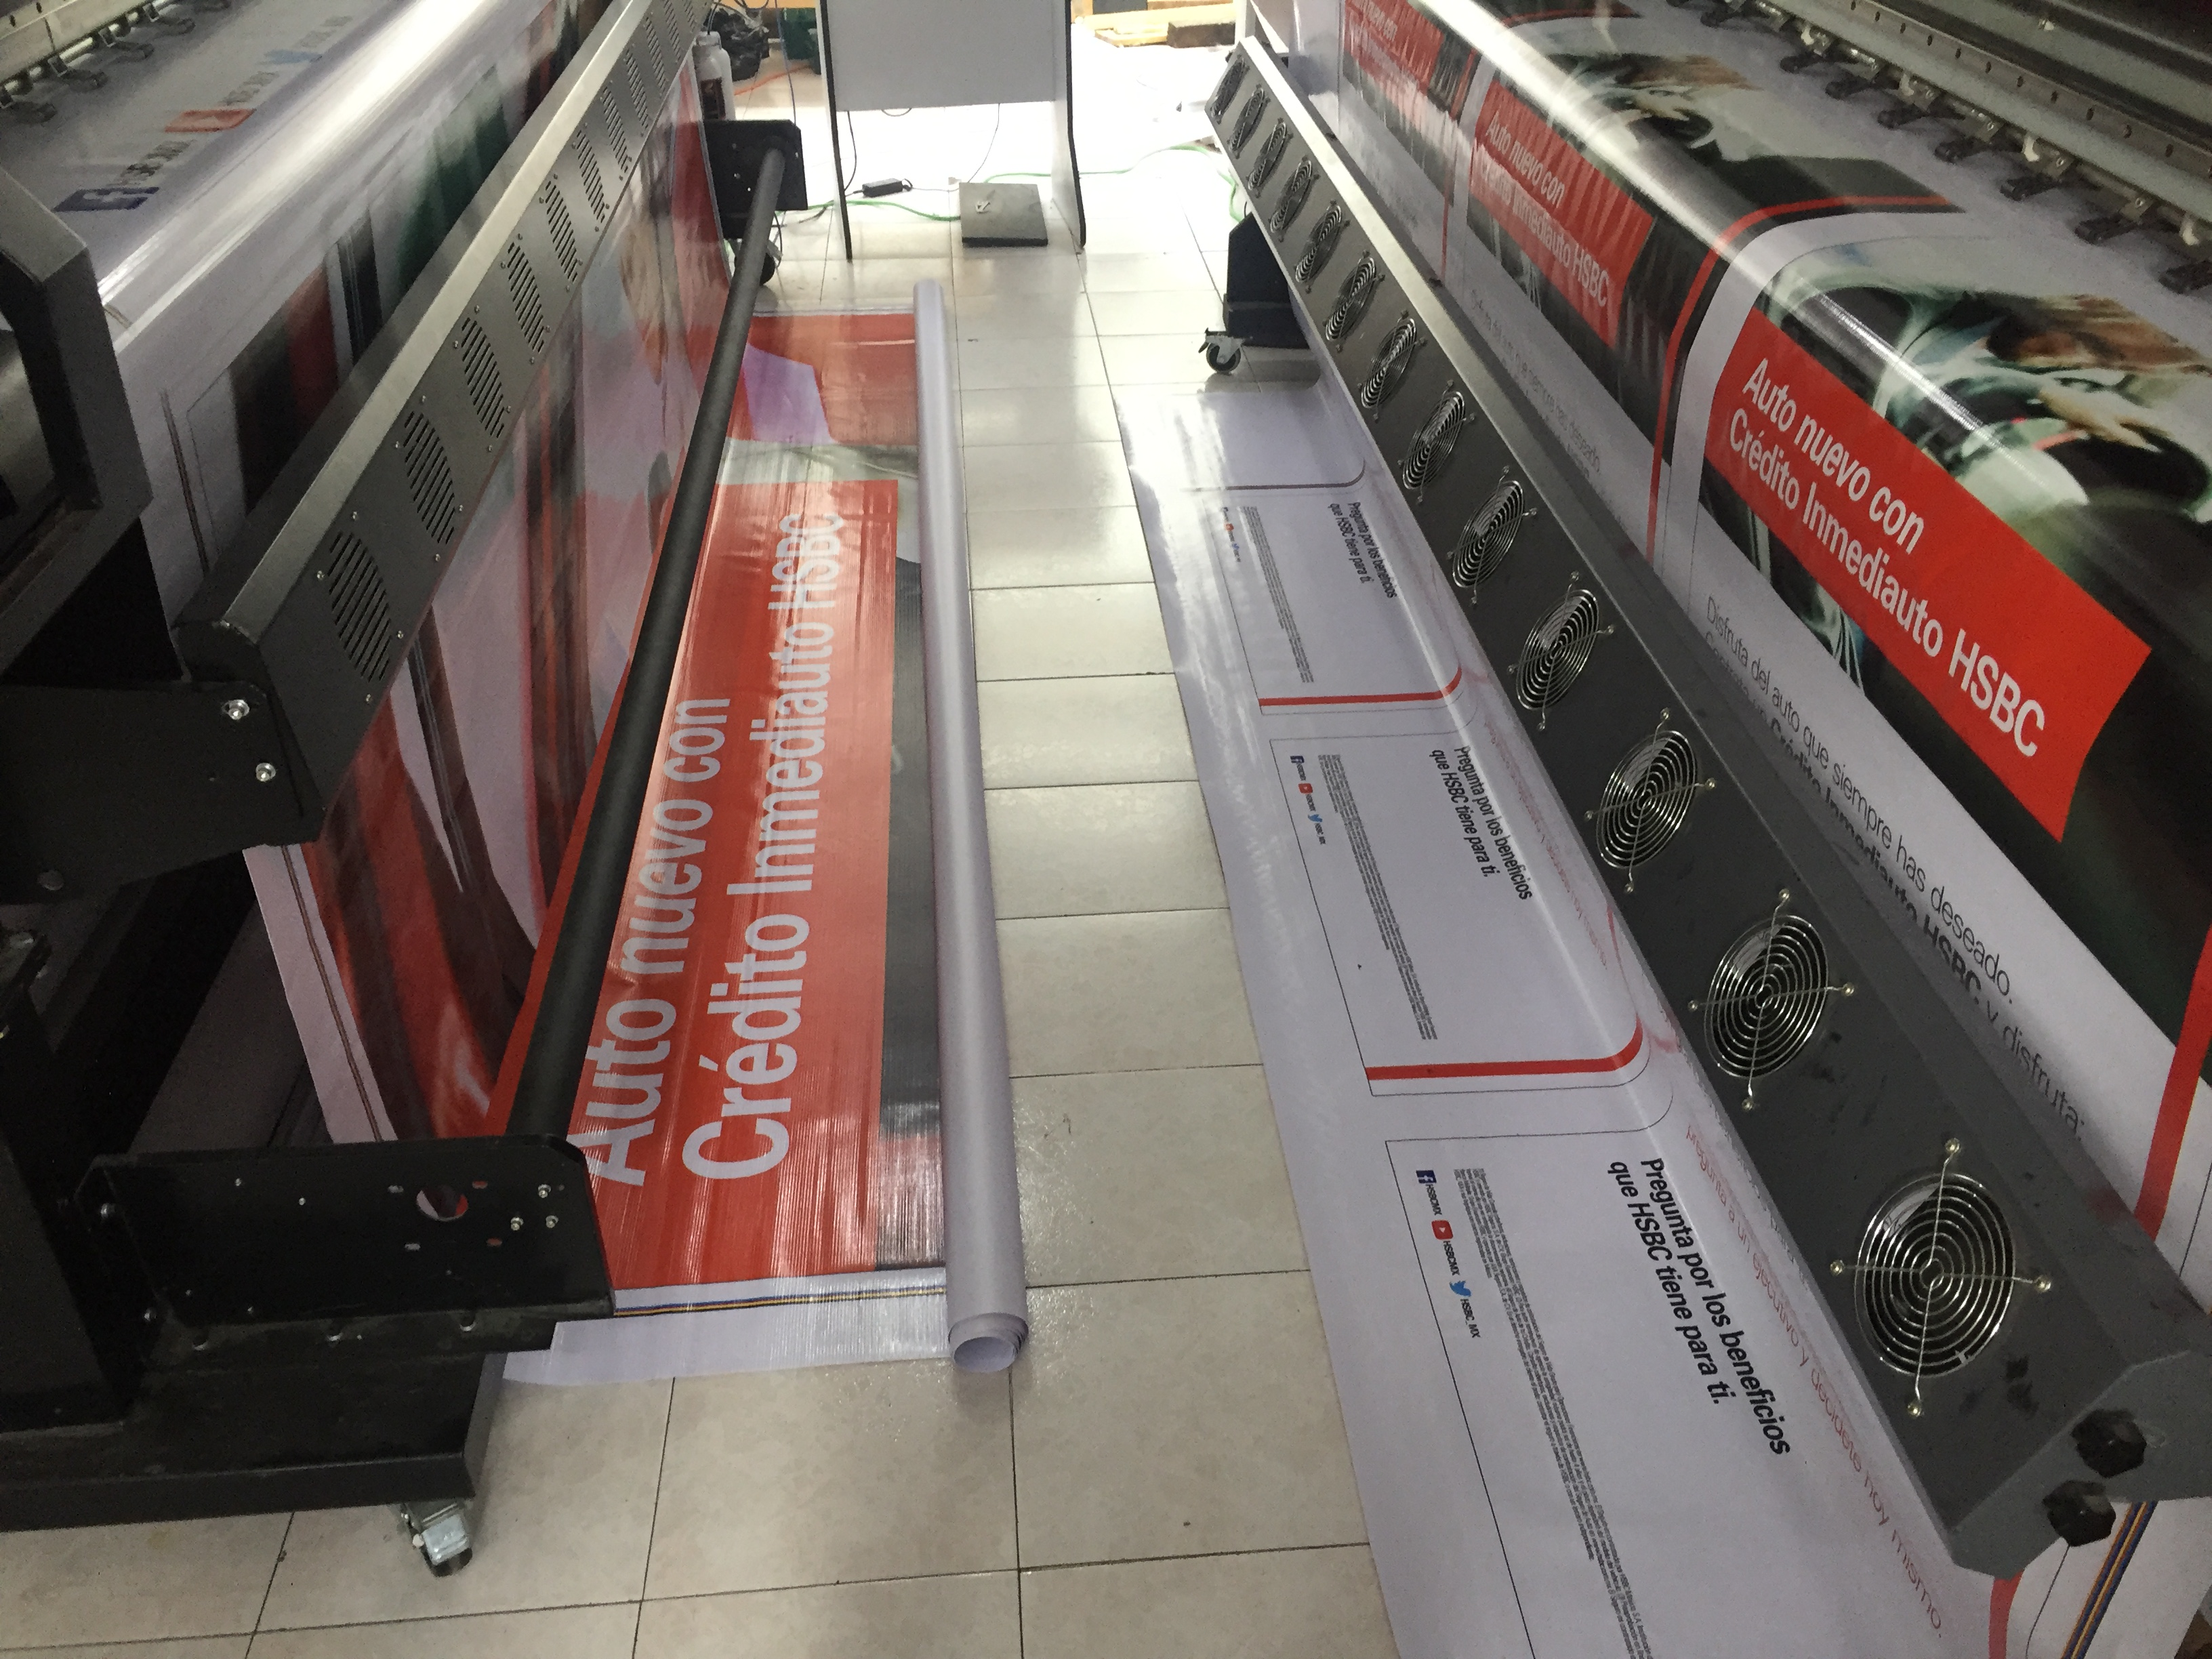 LONA HSBC INMEDIAUTO 2 PLOTTERS